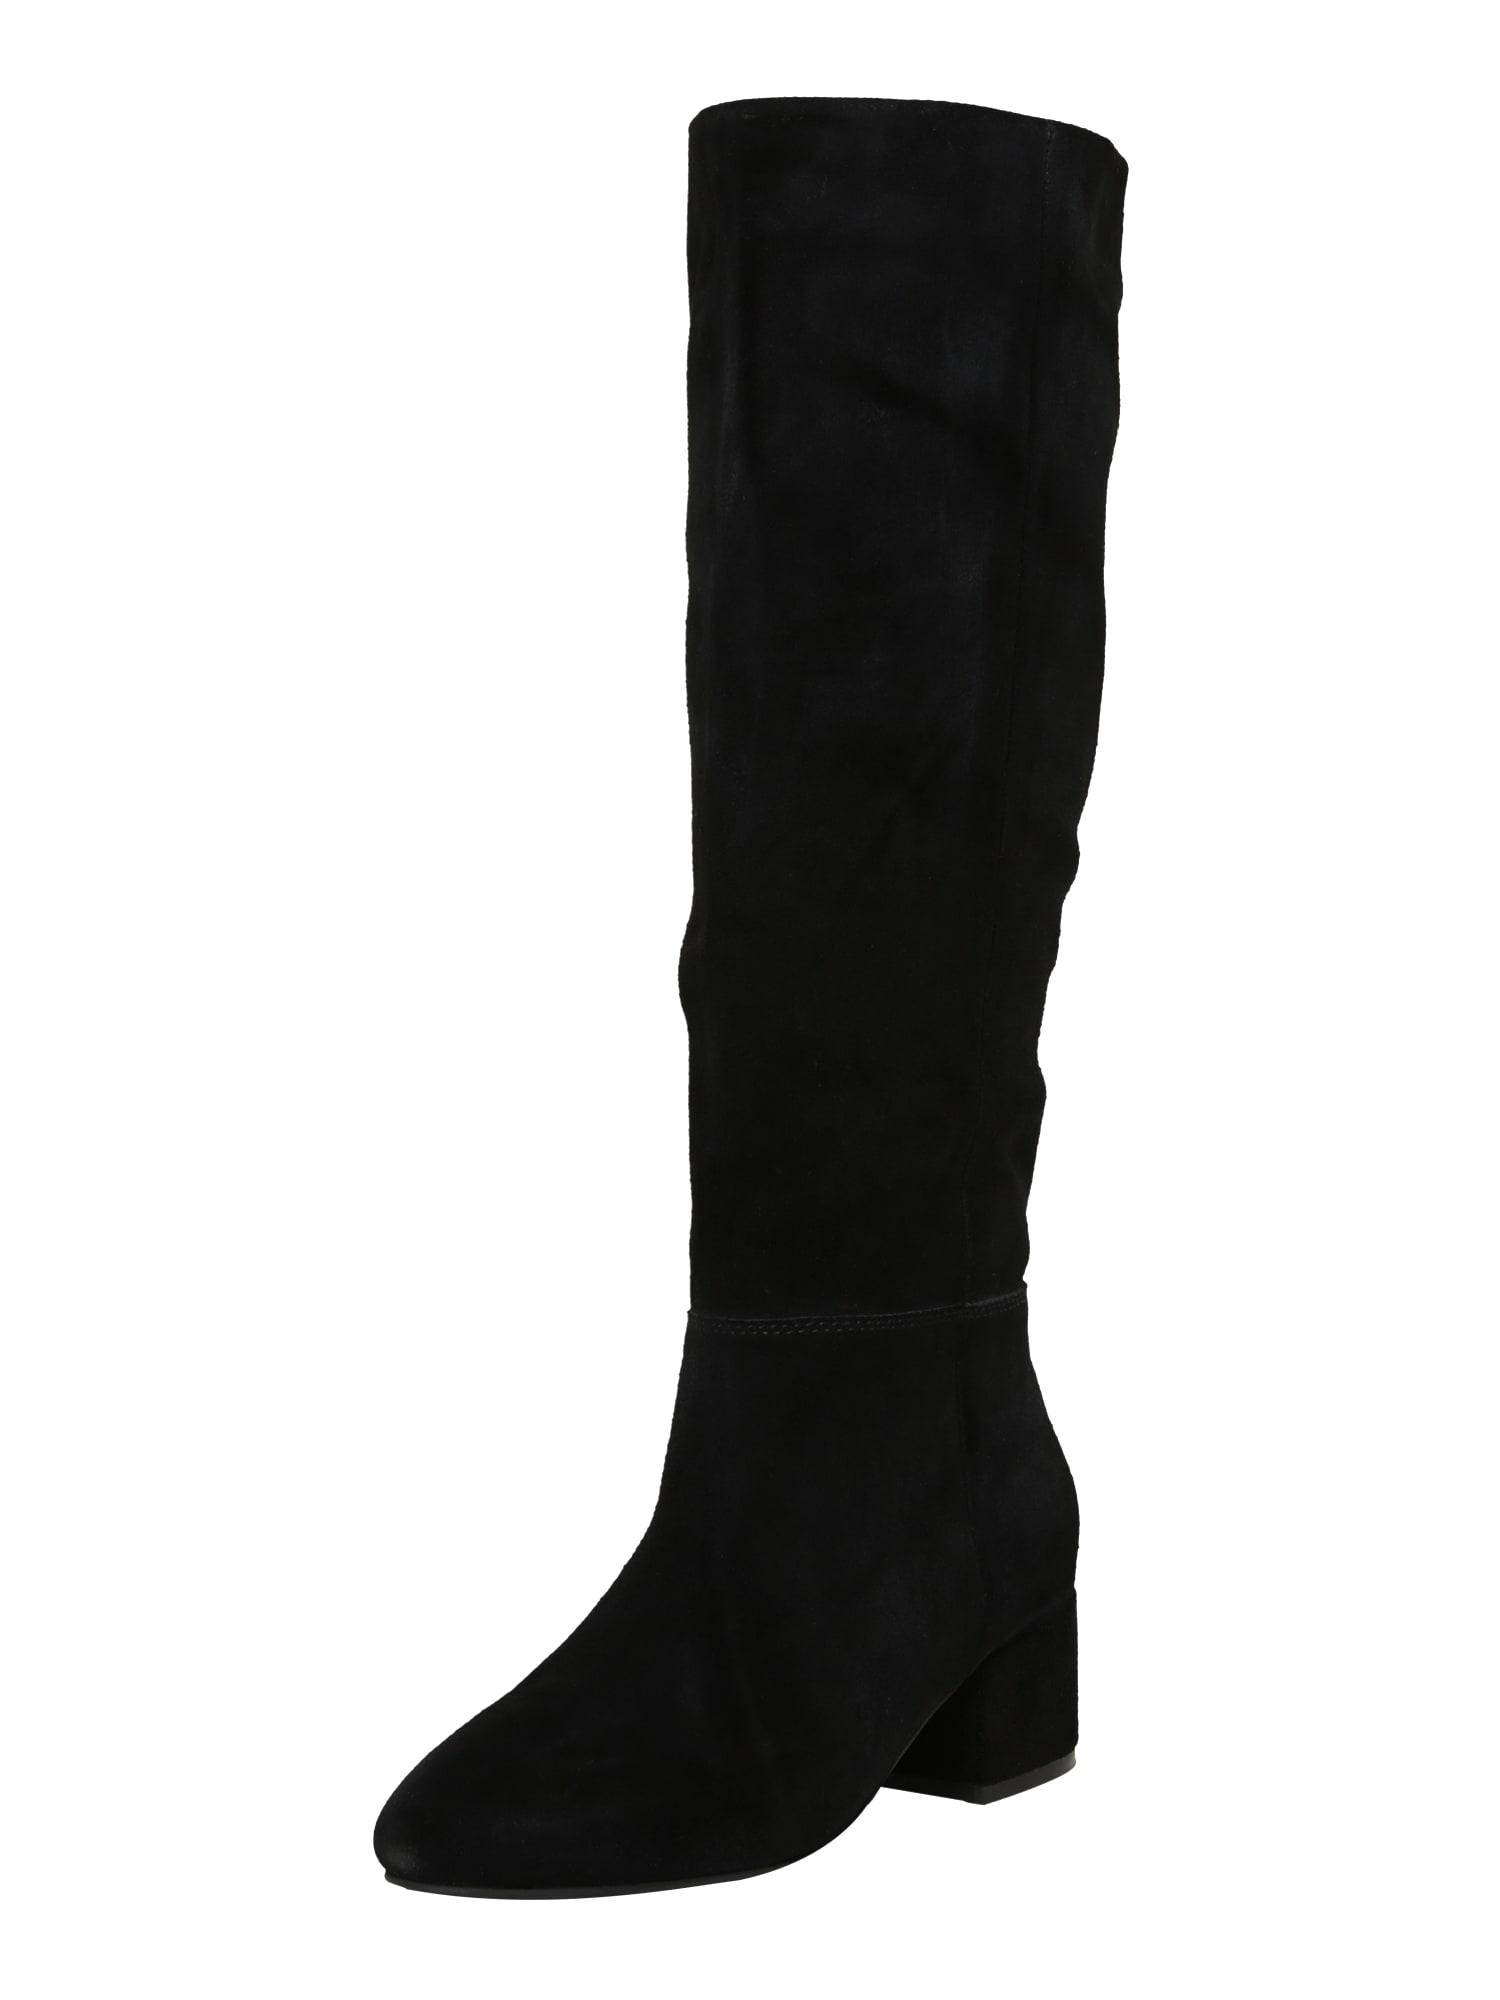 Shoe The Bear Čižmy 'Sophy'  čierna